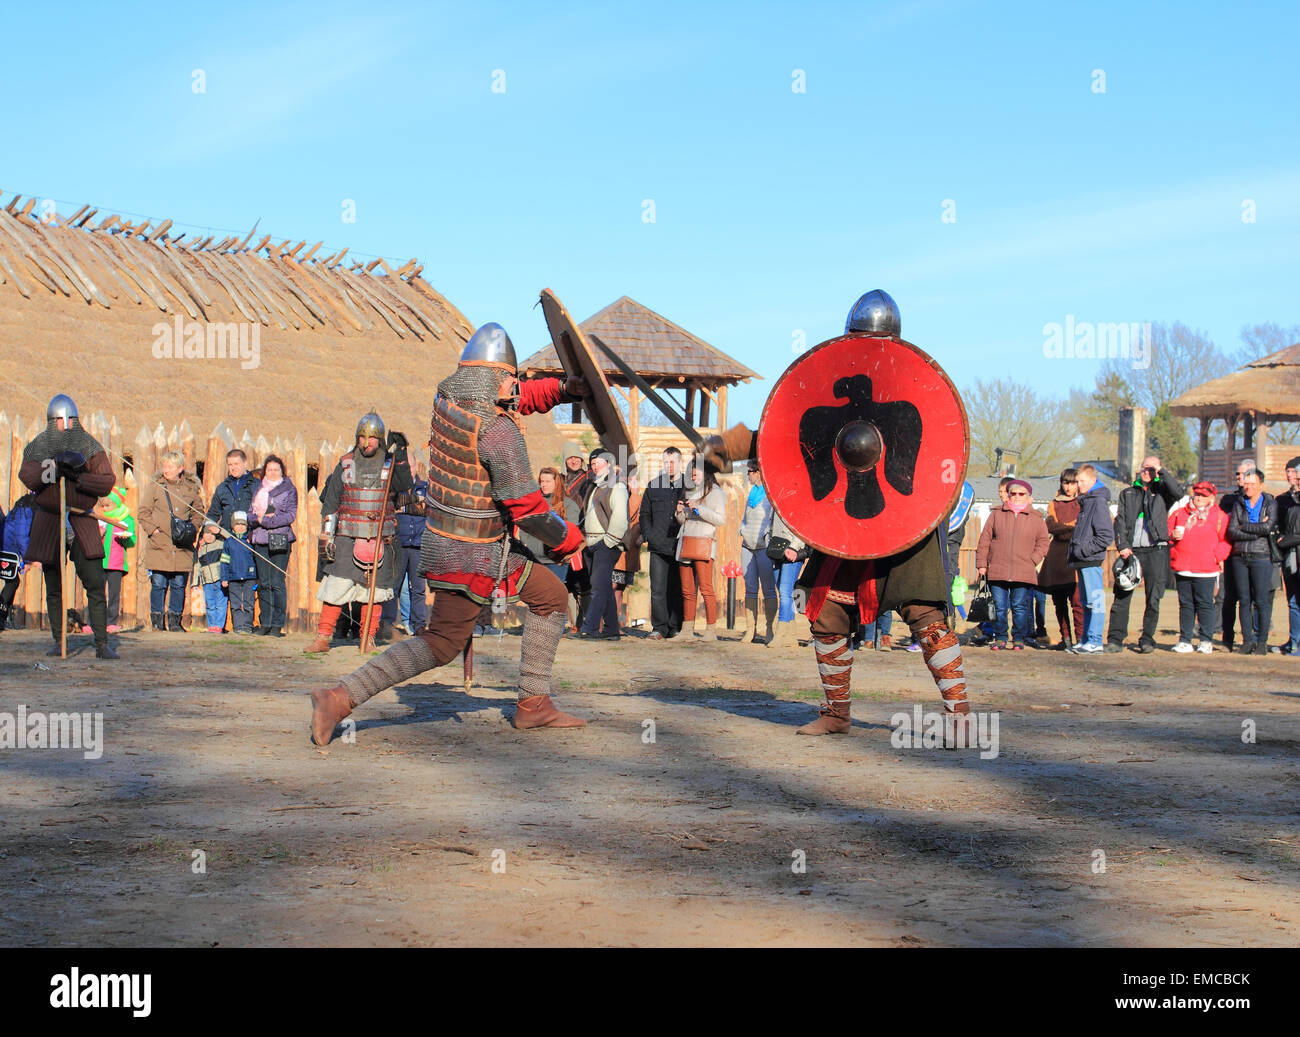 Medieval warriors fighting in acting battle. Slawutowo village, Pomerania region, Poland. - Stock Image